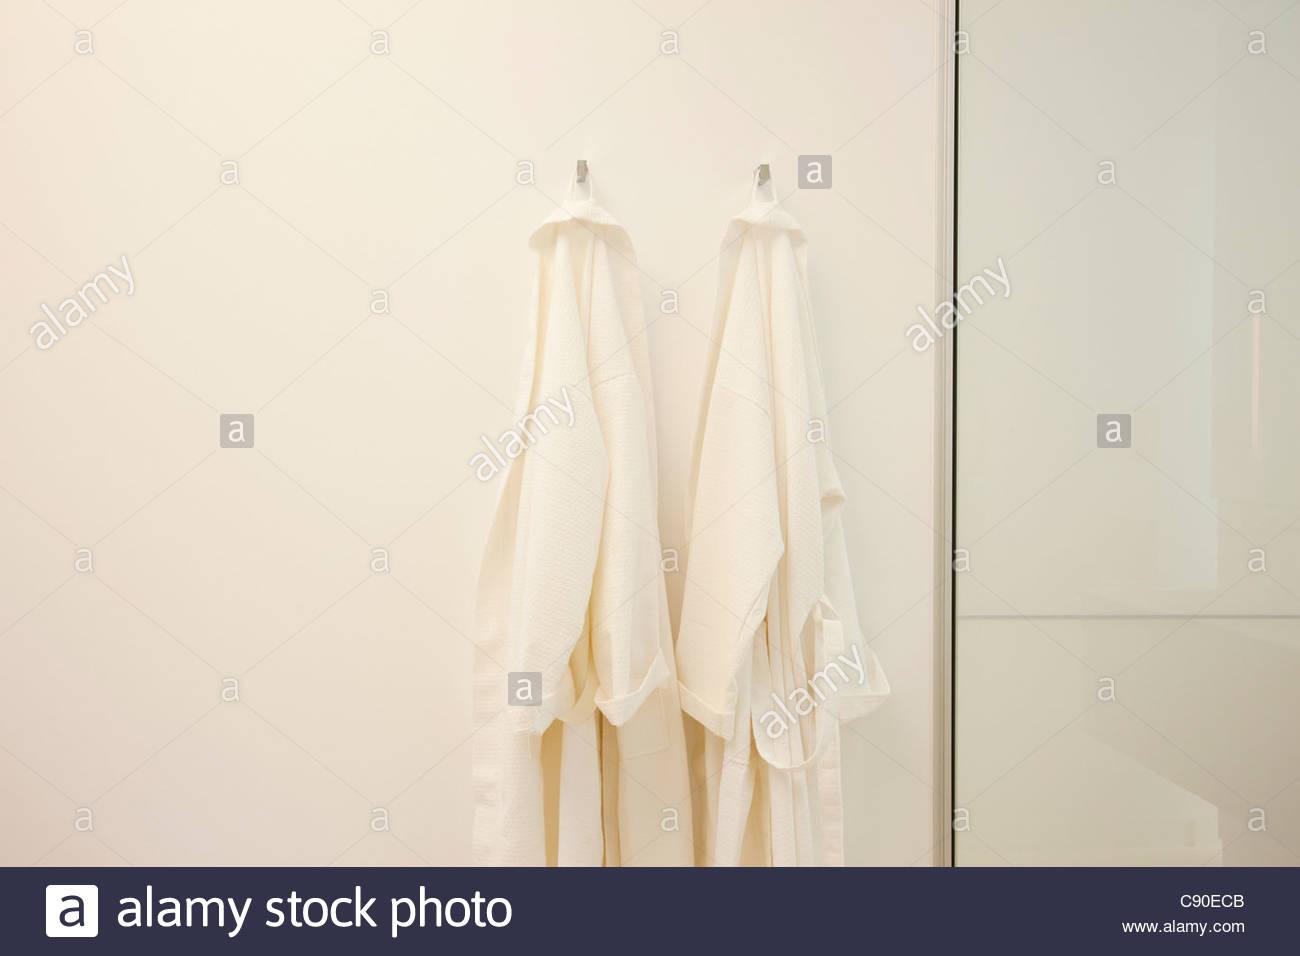 Dangling Stockfotos & Dangling Bilder - Alamy